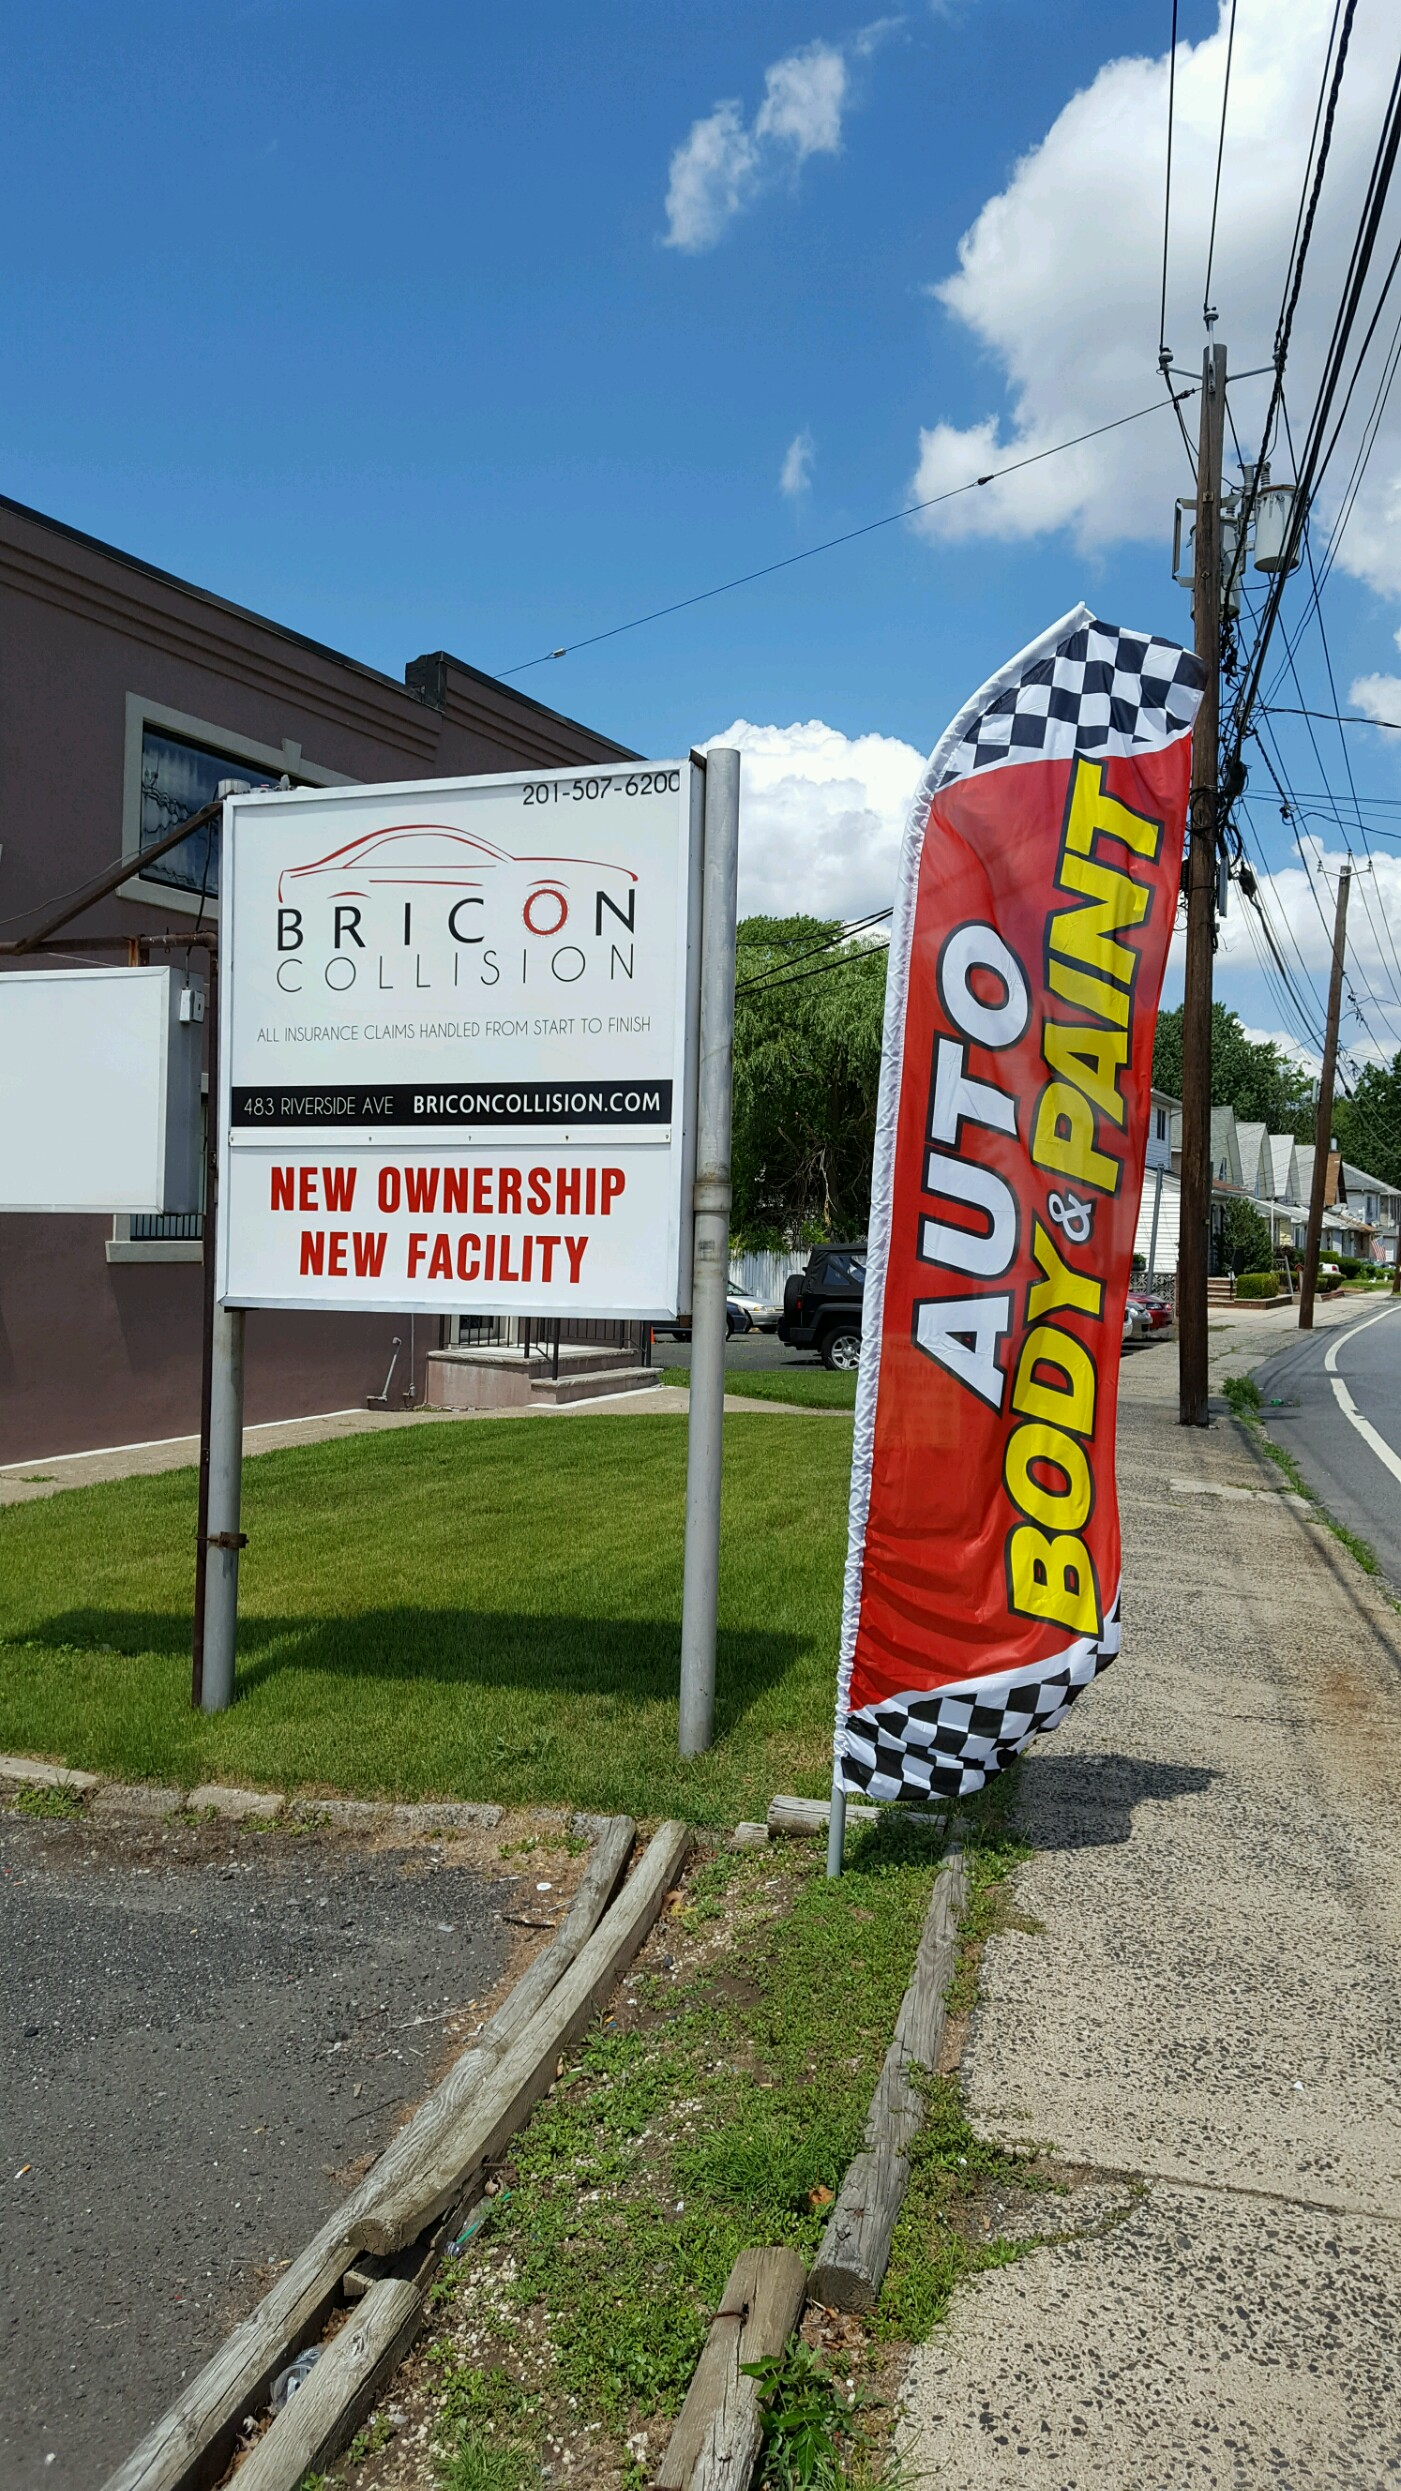 Bricon Collision, LLC 483 Riverside Ave, Lyndhurst